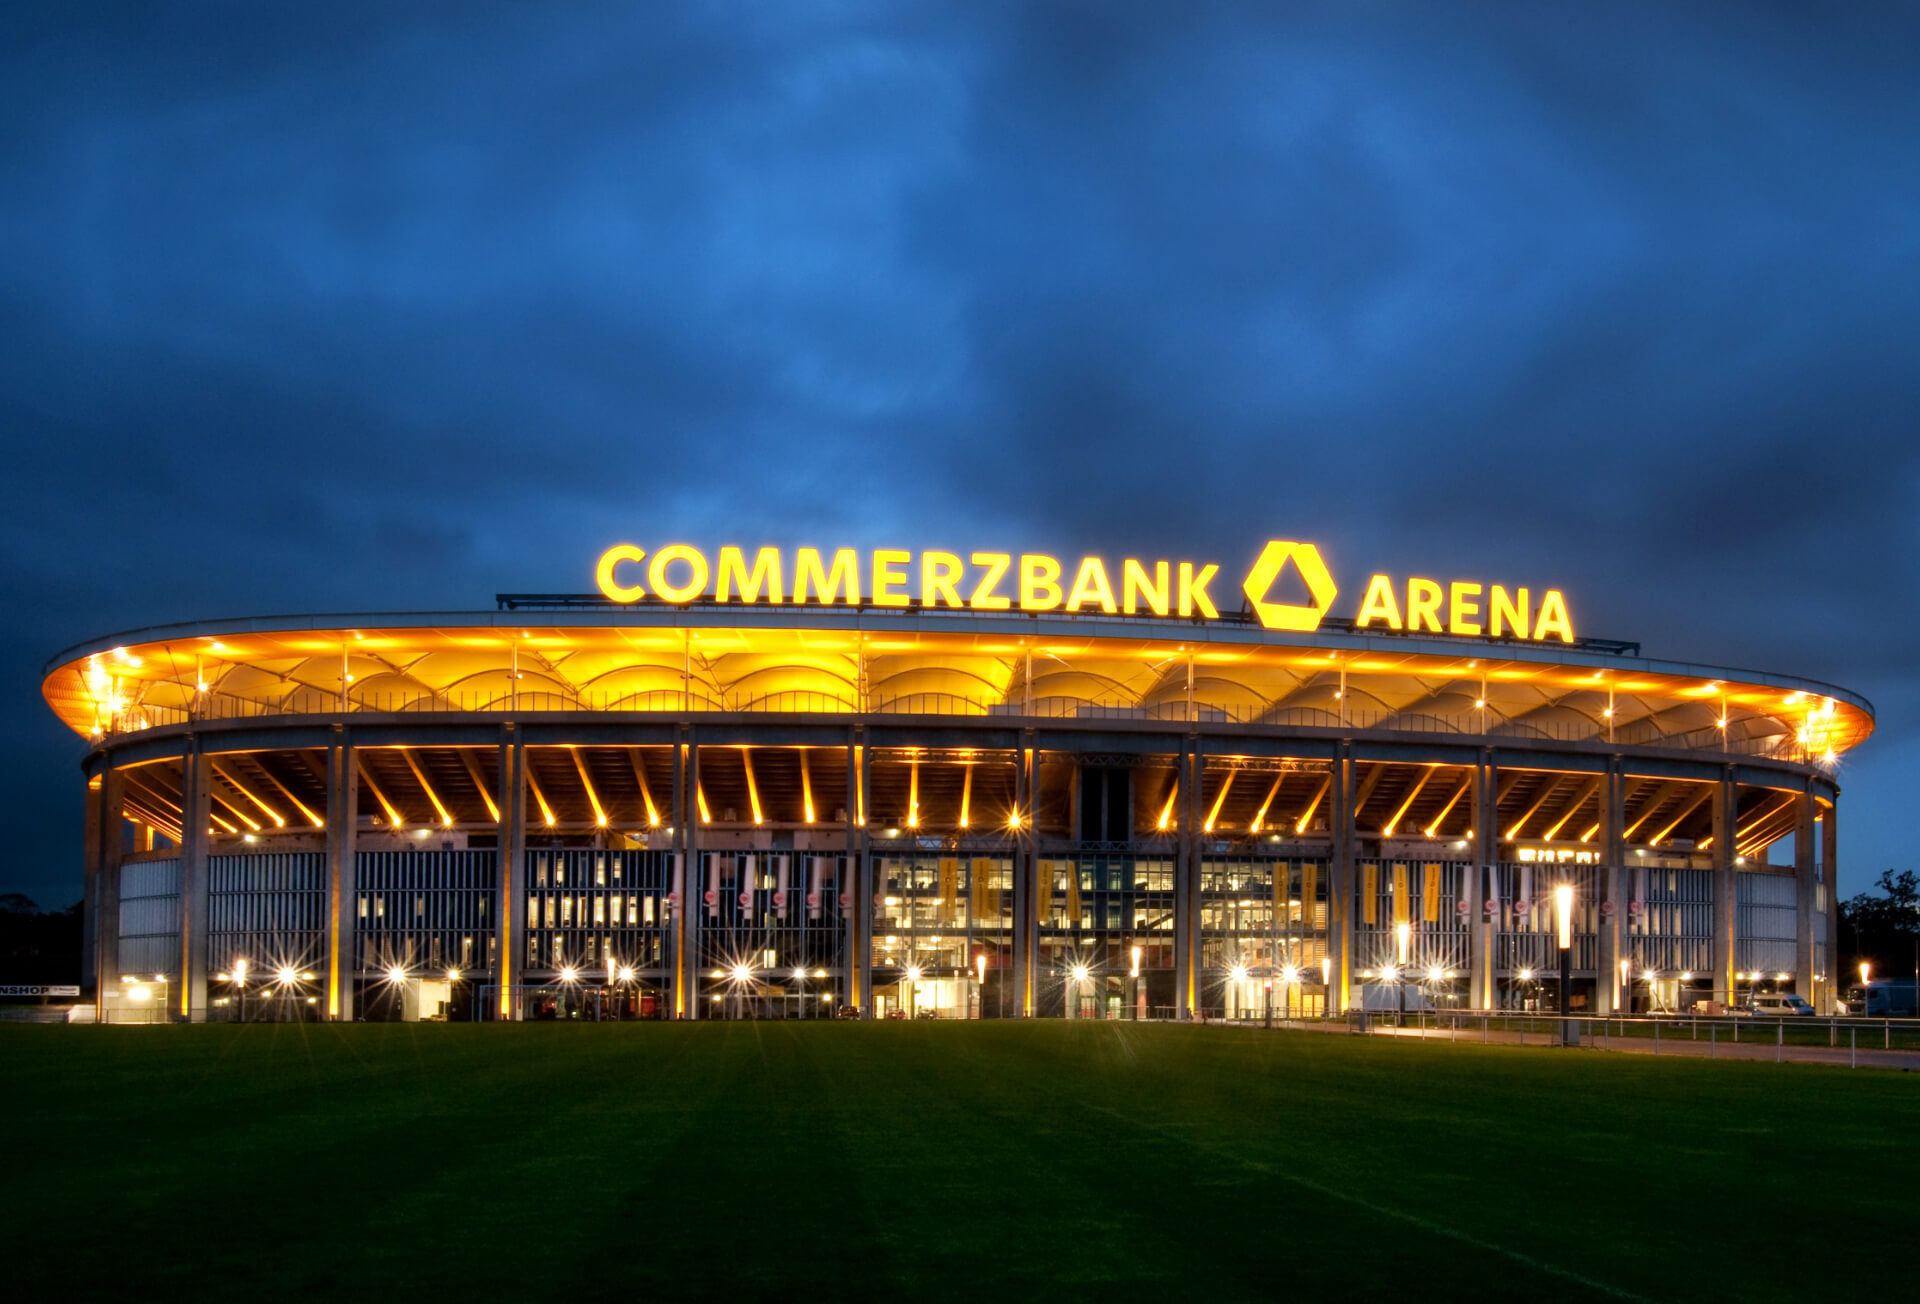 Hotel Nähe Commerzbank Arena Frankfurt